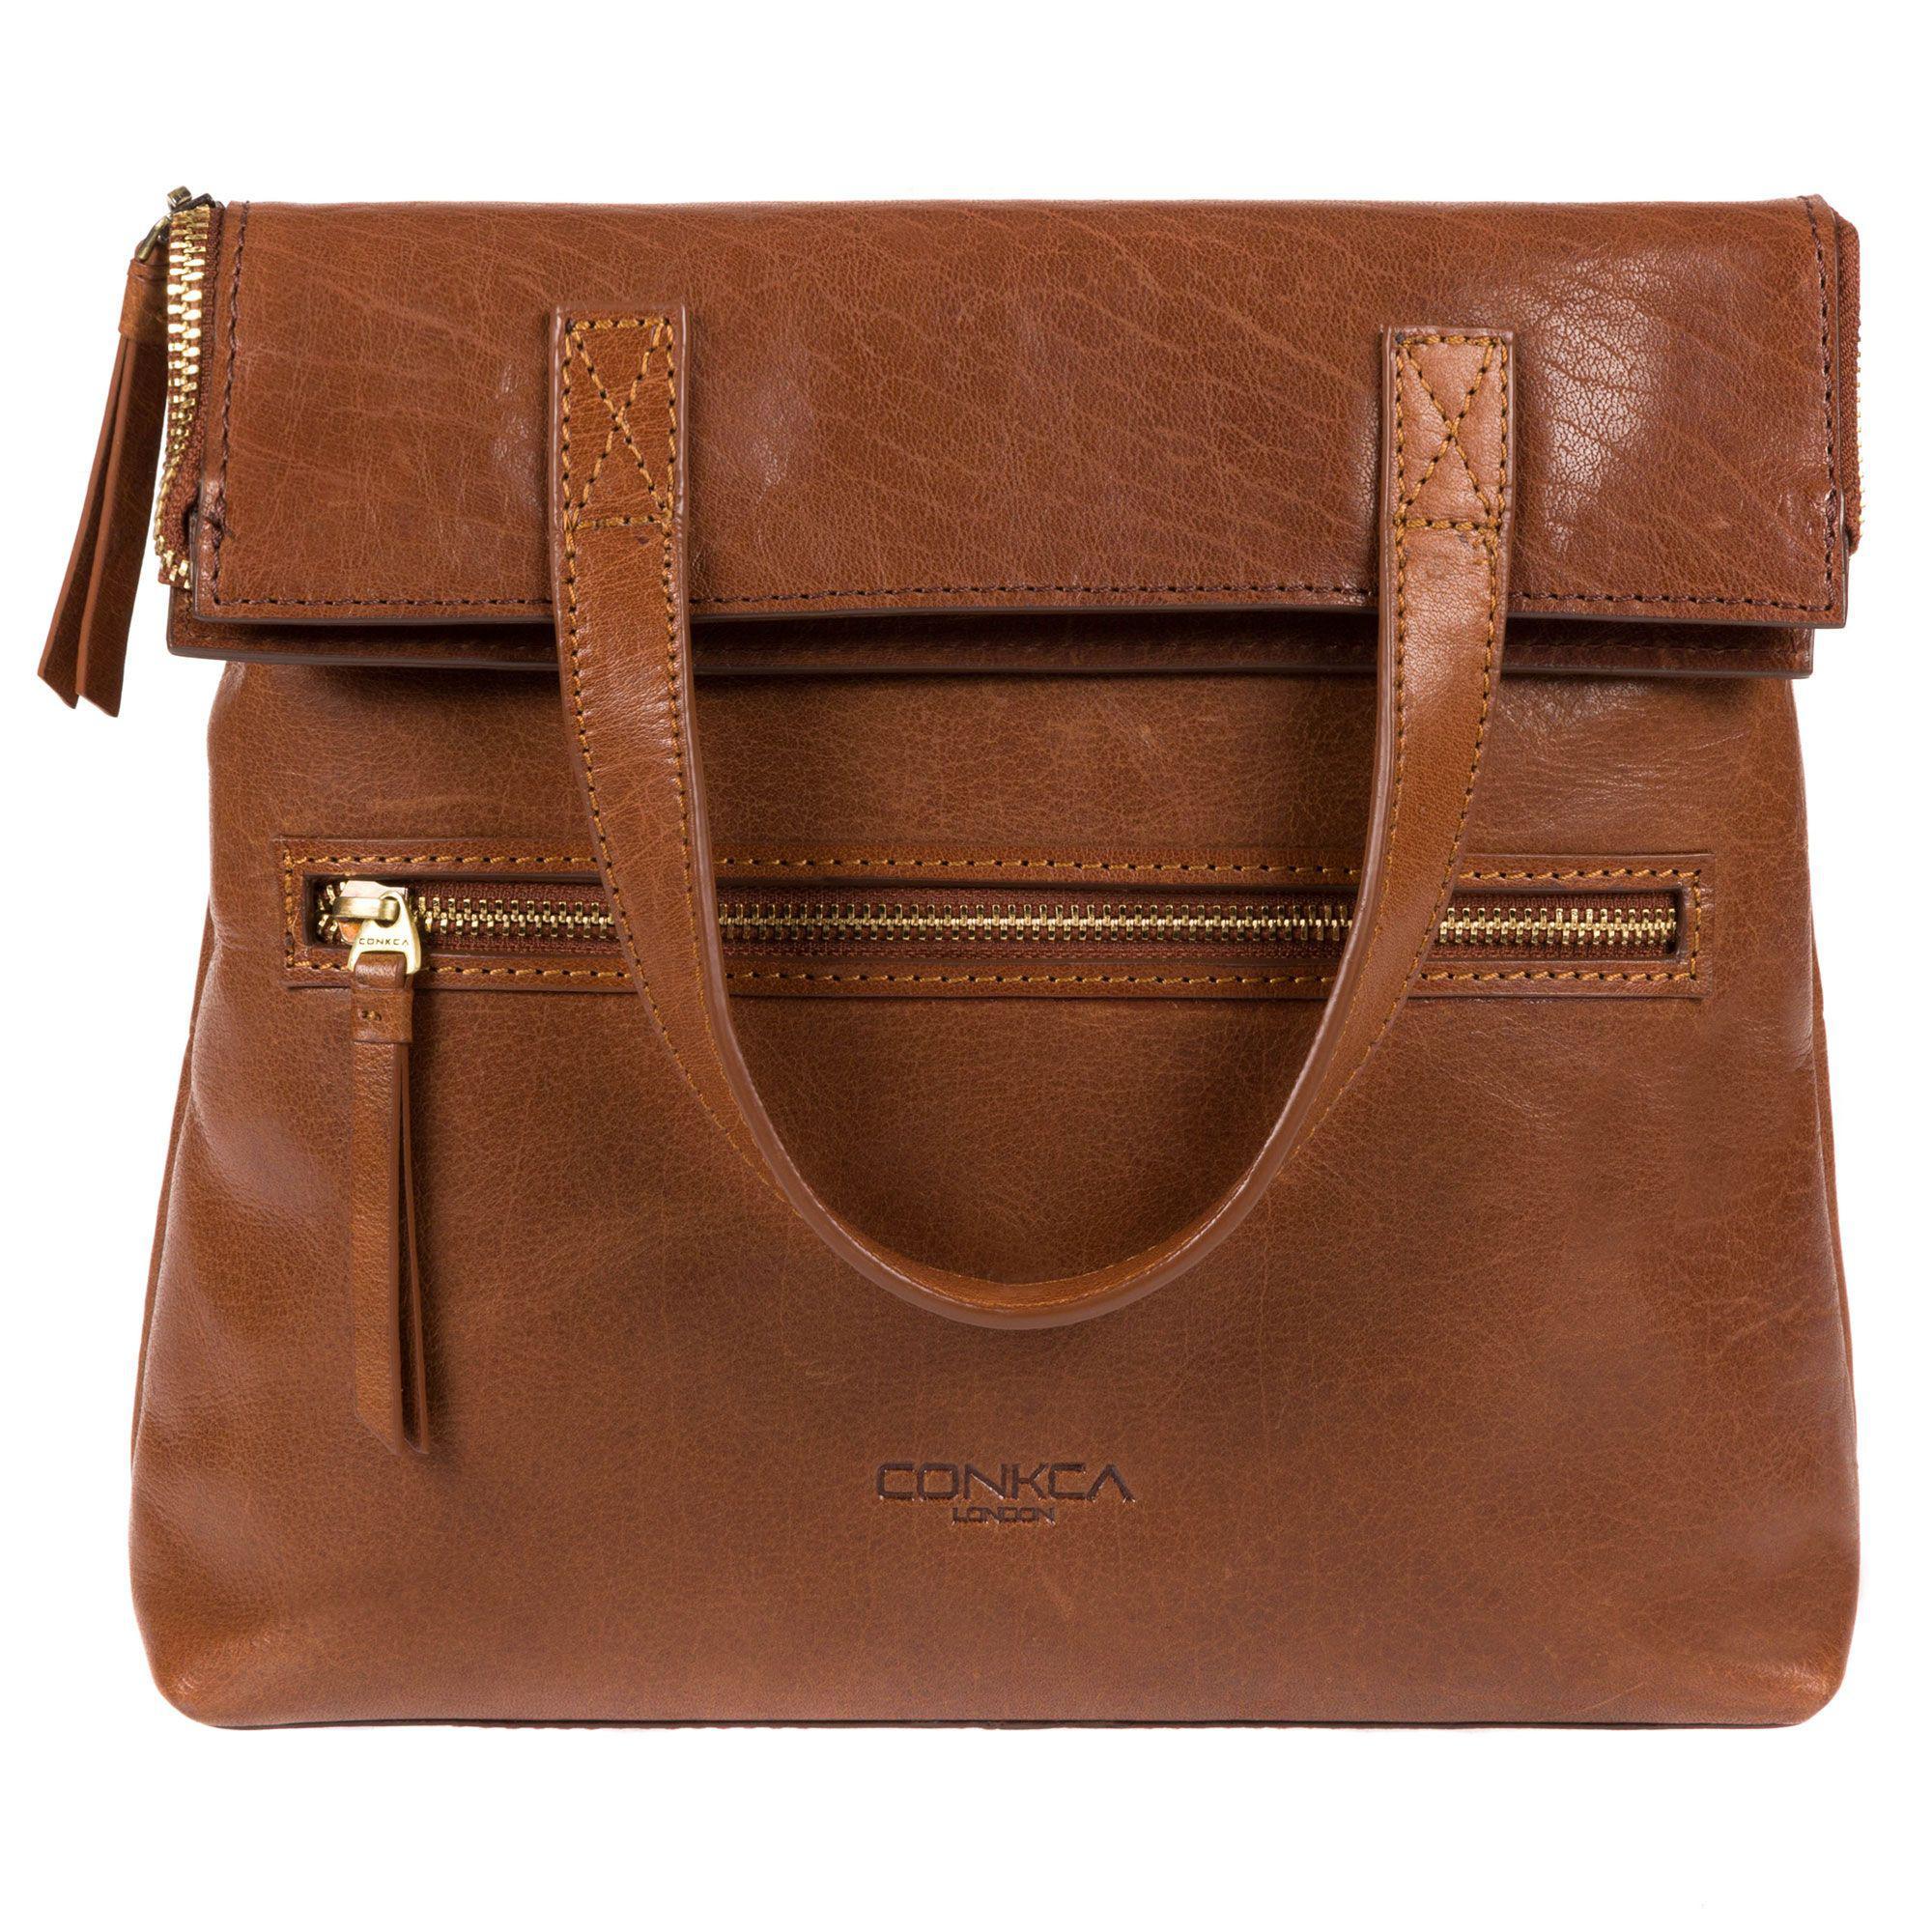 c8abaea2e9a9 Conkca London Conker Brown And Dark Tan  anoushka  Handmade Leather ...